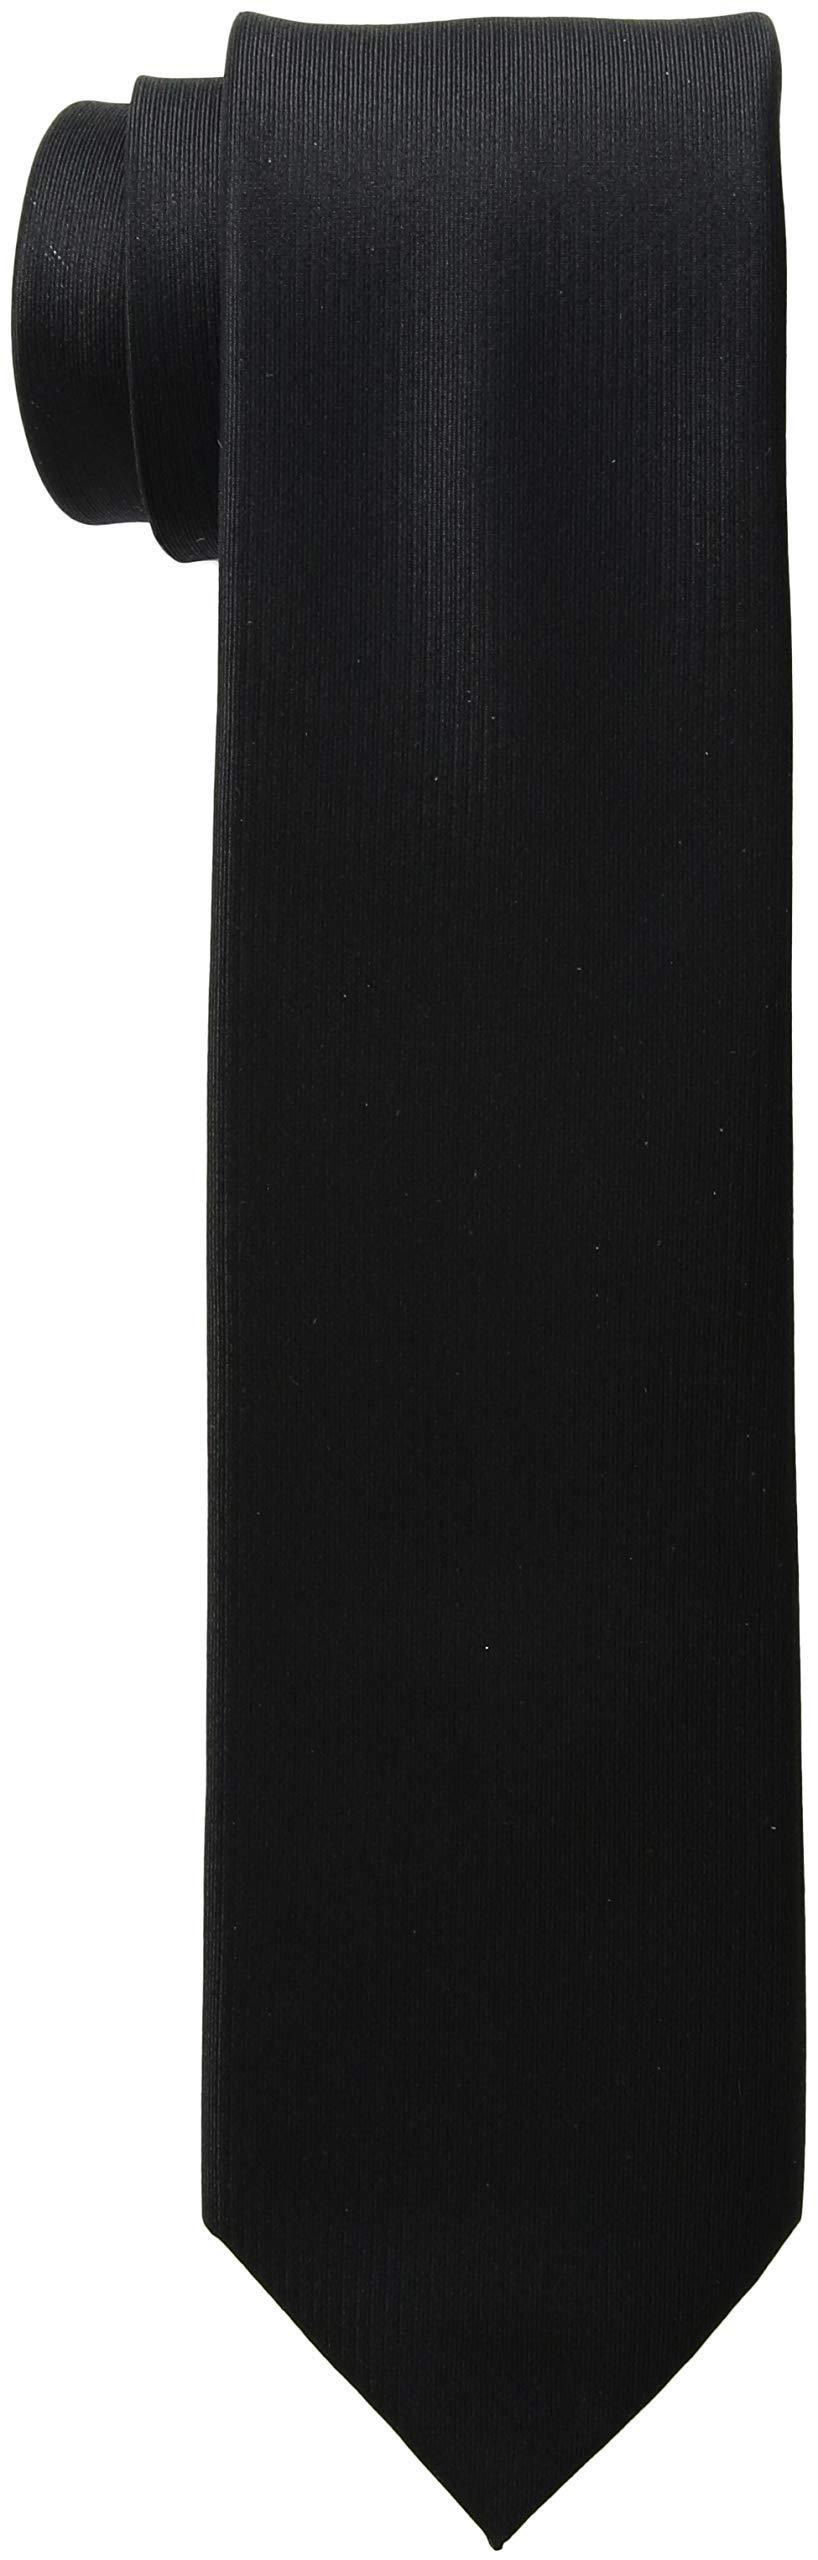 Kenneth Cole REACTION Men's Darien Solid Tie, Black, One Size